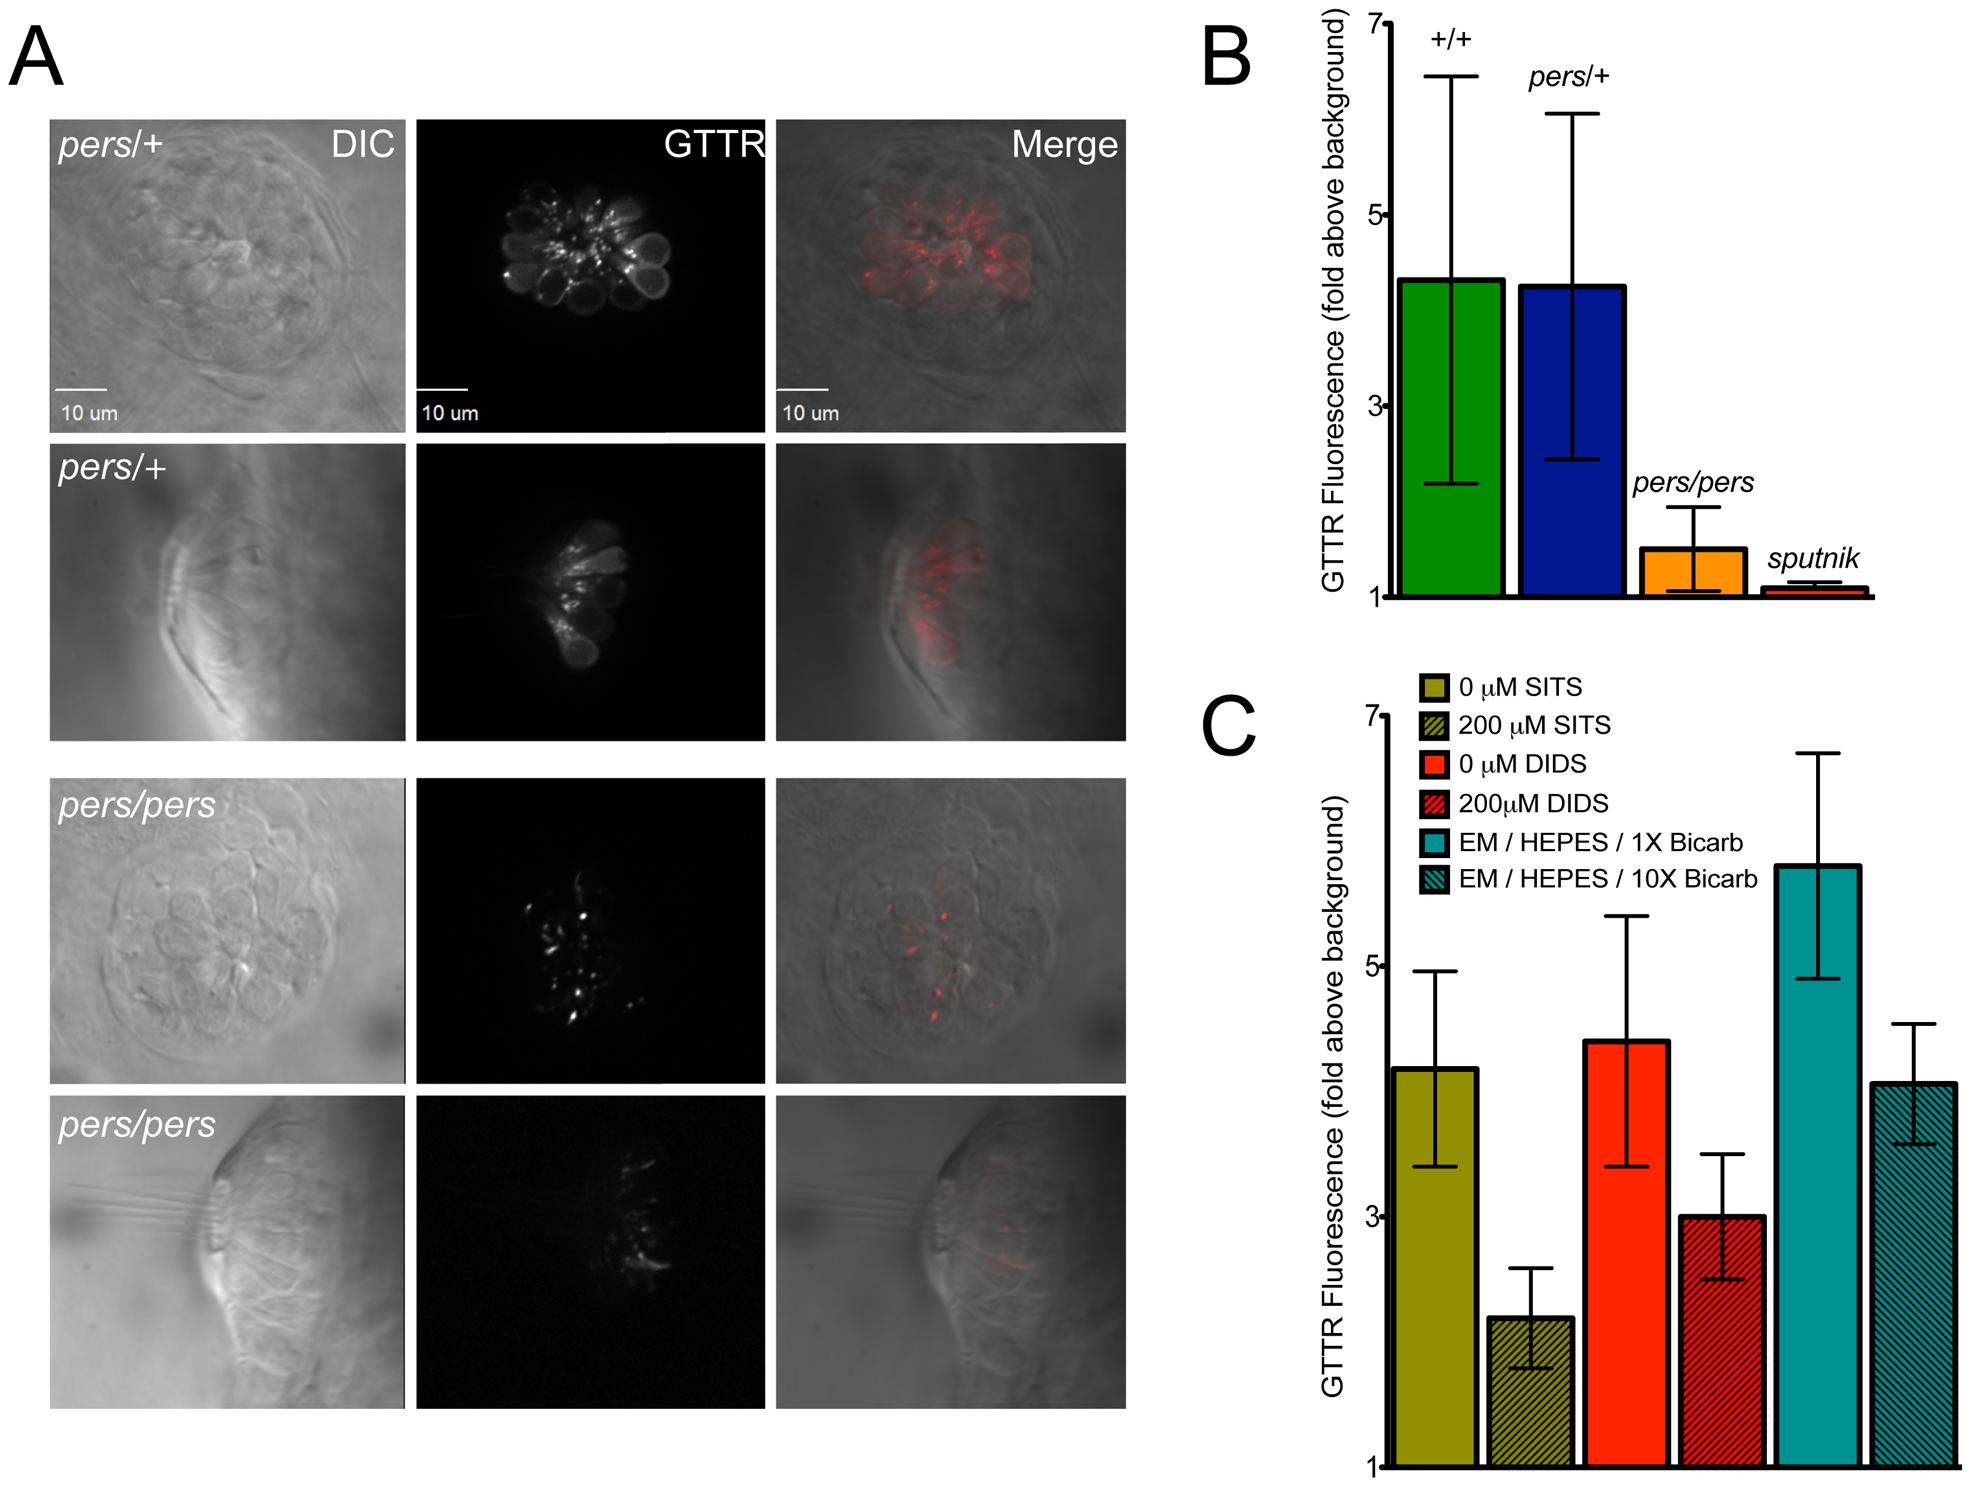 <i>persephone</i>, SLC4 inhibitors, and high bicarbonate all reduce gentamicin uptake.